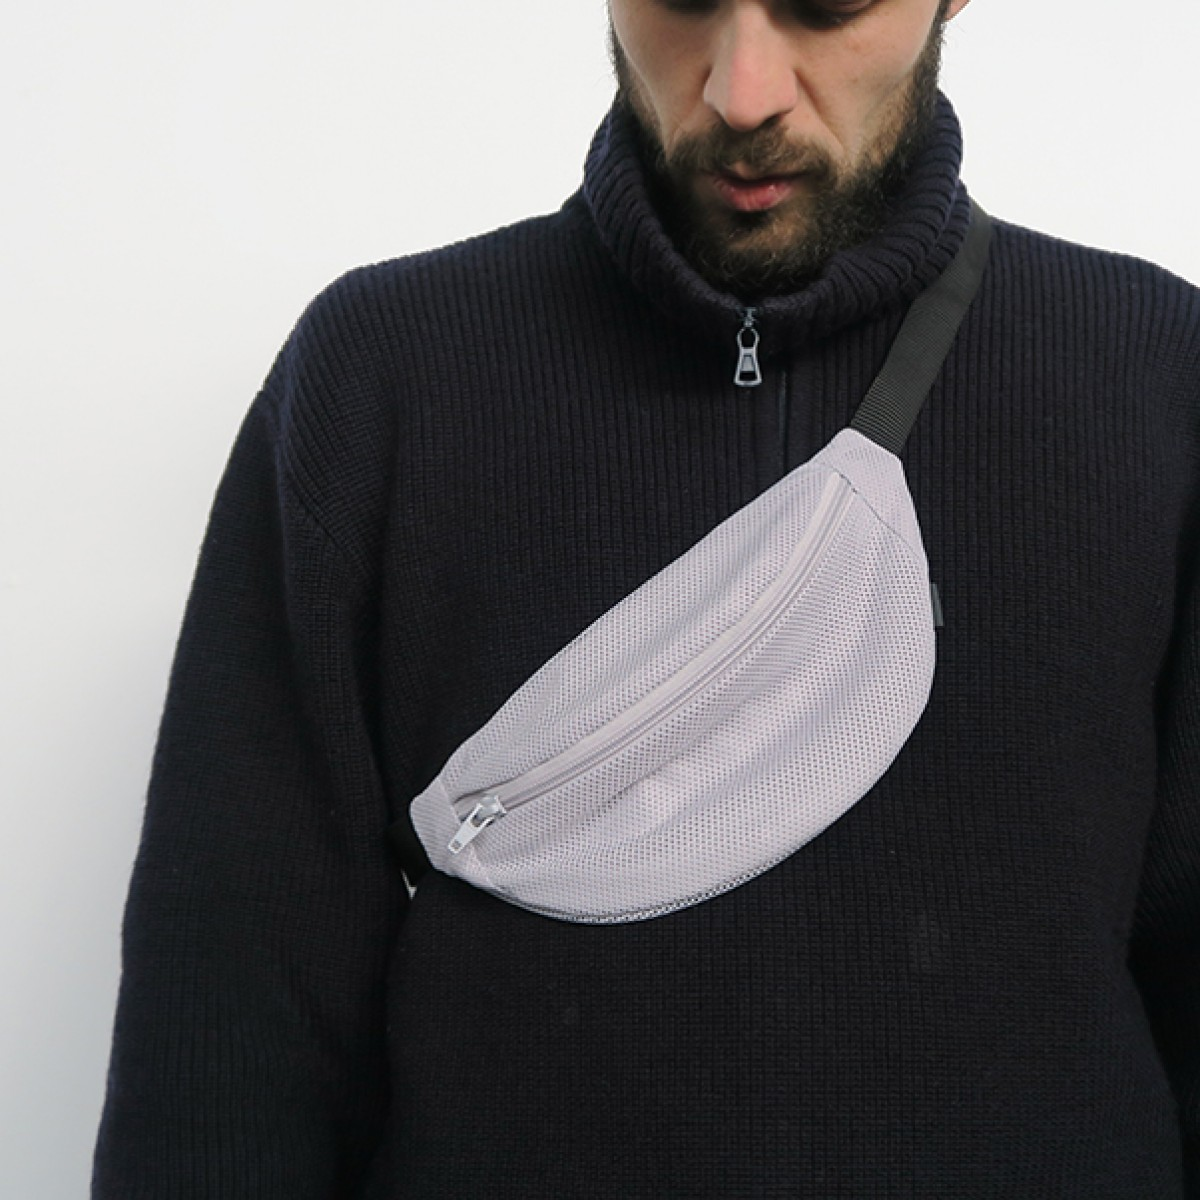 FINSTER hipbag grey mesh